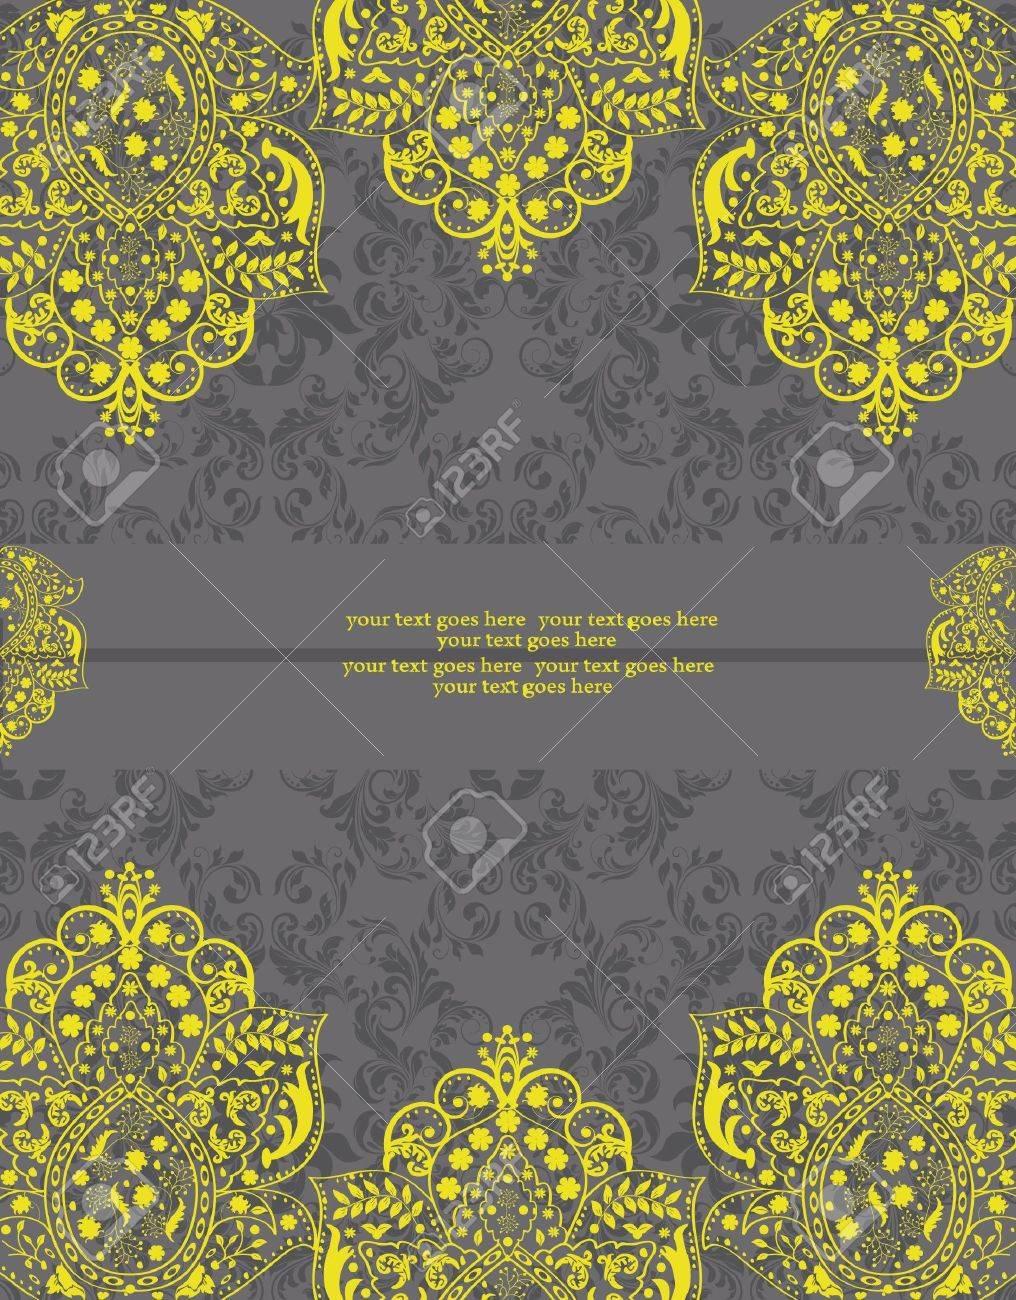 Yellow and Gray Damask Wedding Invitation Stock Vector - 17002473